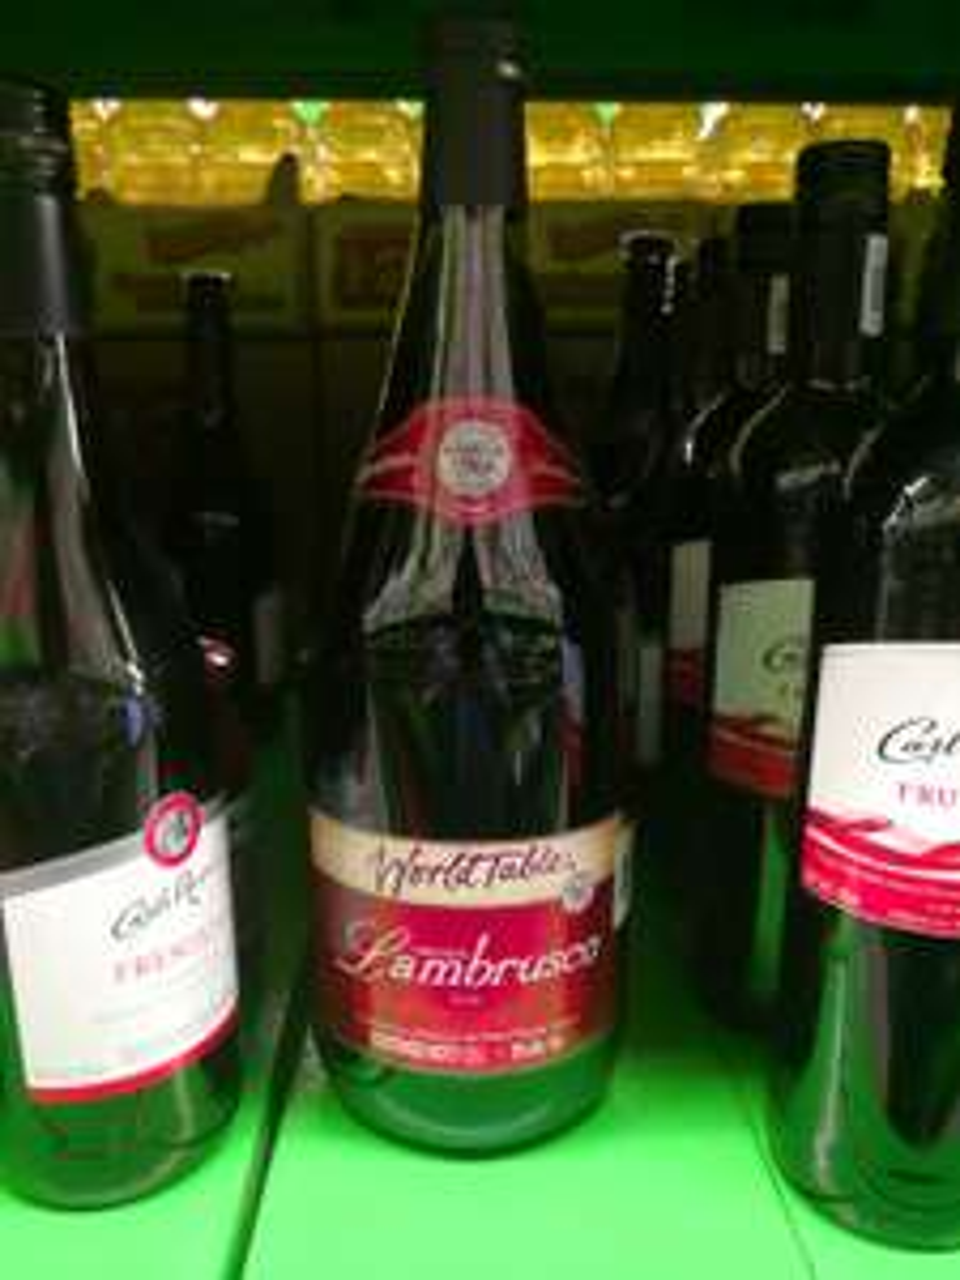 Vino tipo Lambrusco 1.5lts (italiano importado por Great Value)